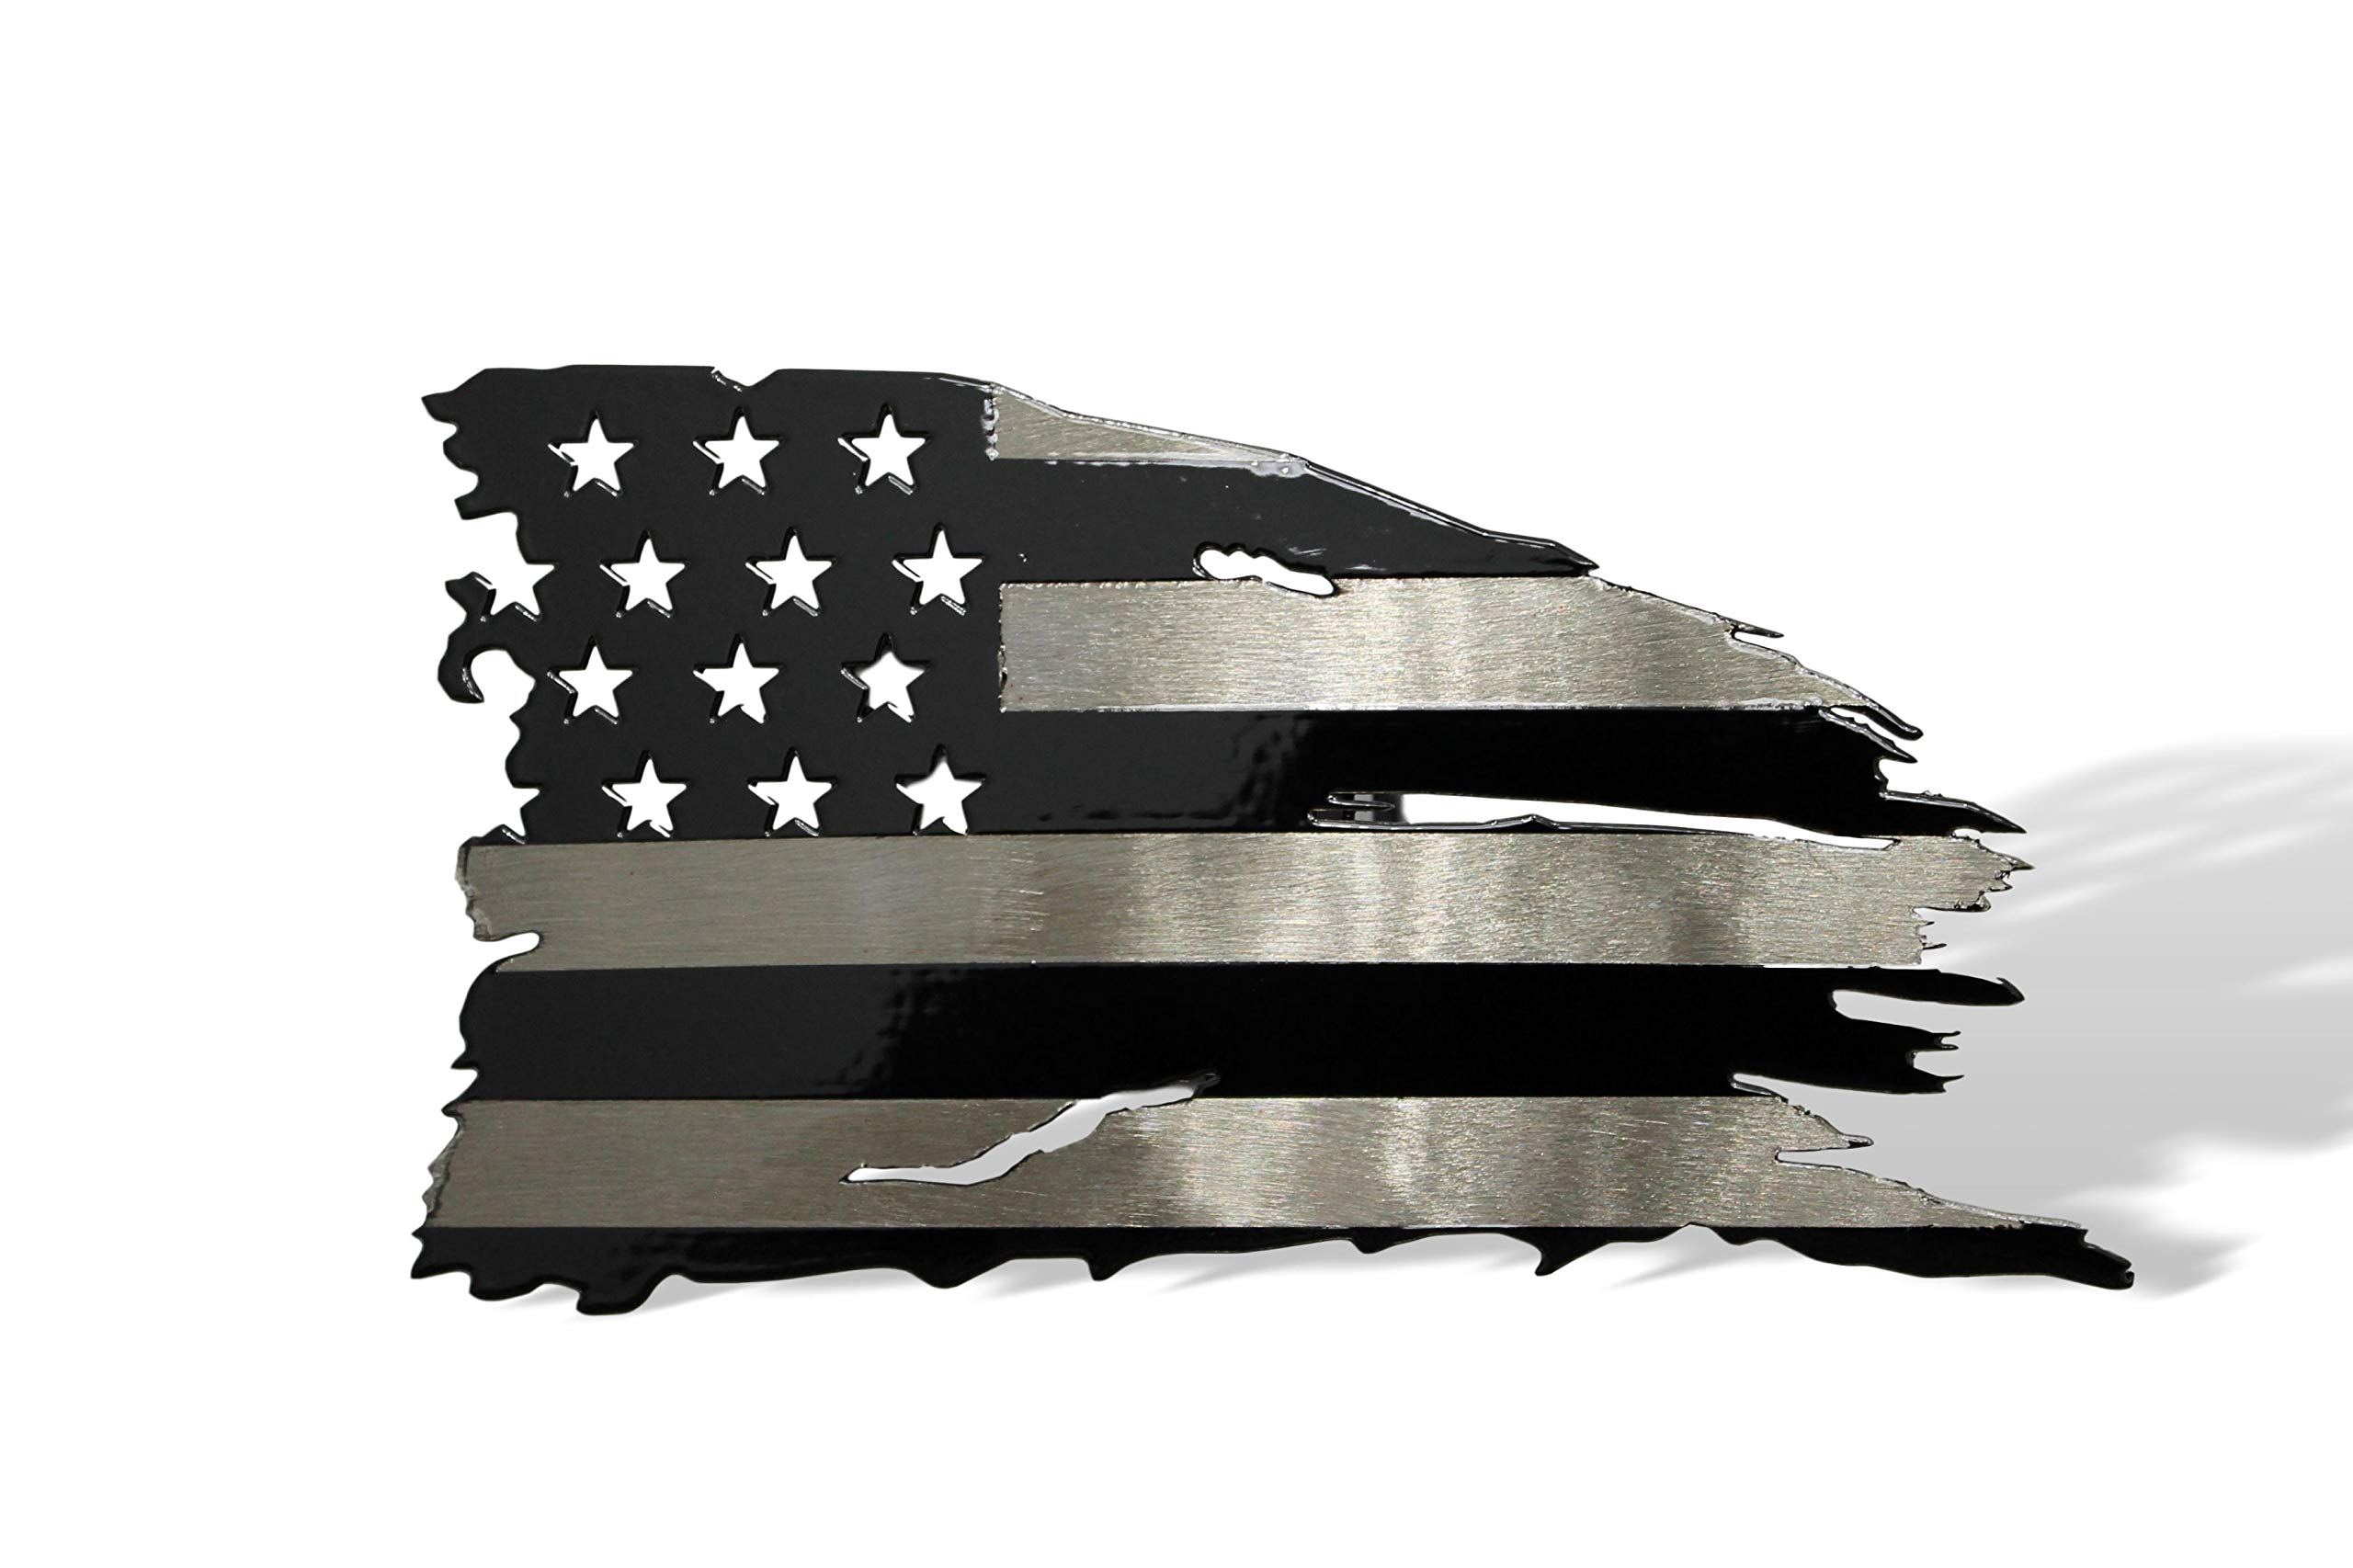 Fox MetalFab Powder Coated Steel Subdued American Flag Trailer Hitch Cover/Insert by Fox MetalFab